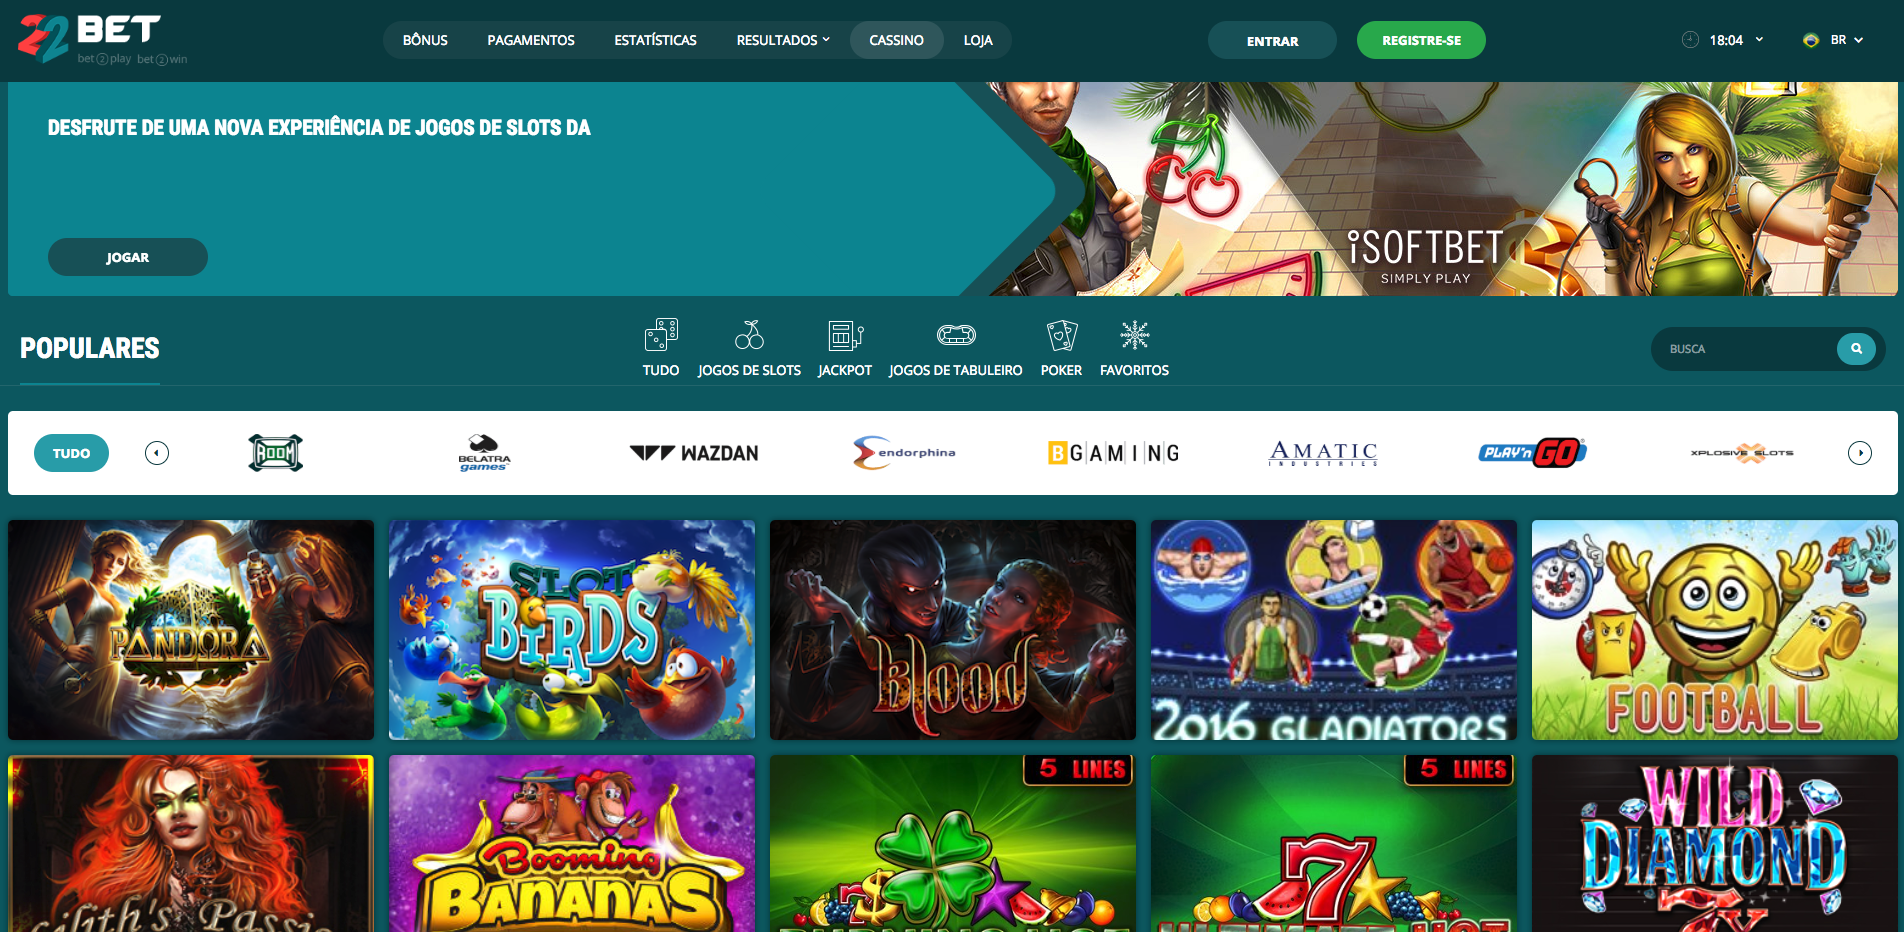 Wild casino Brasil 22bet 322754